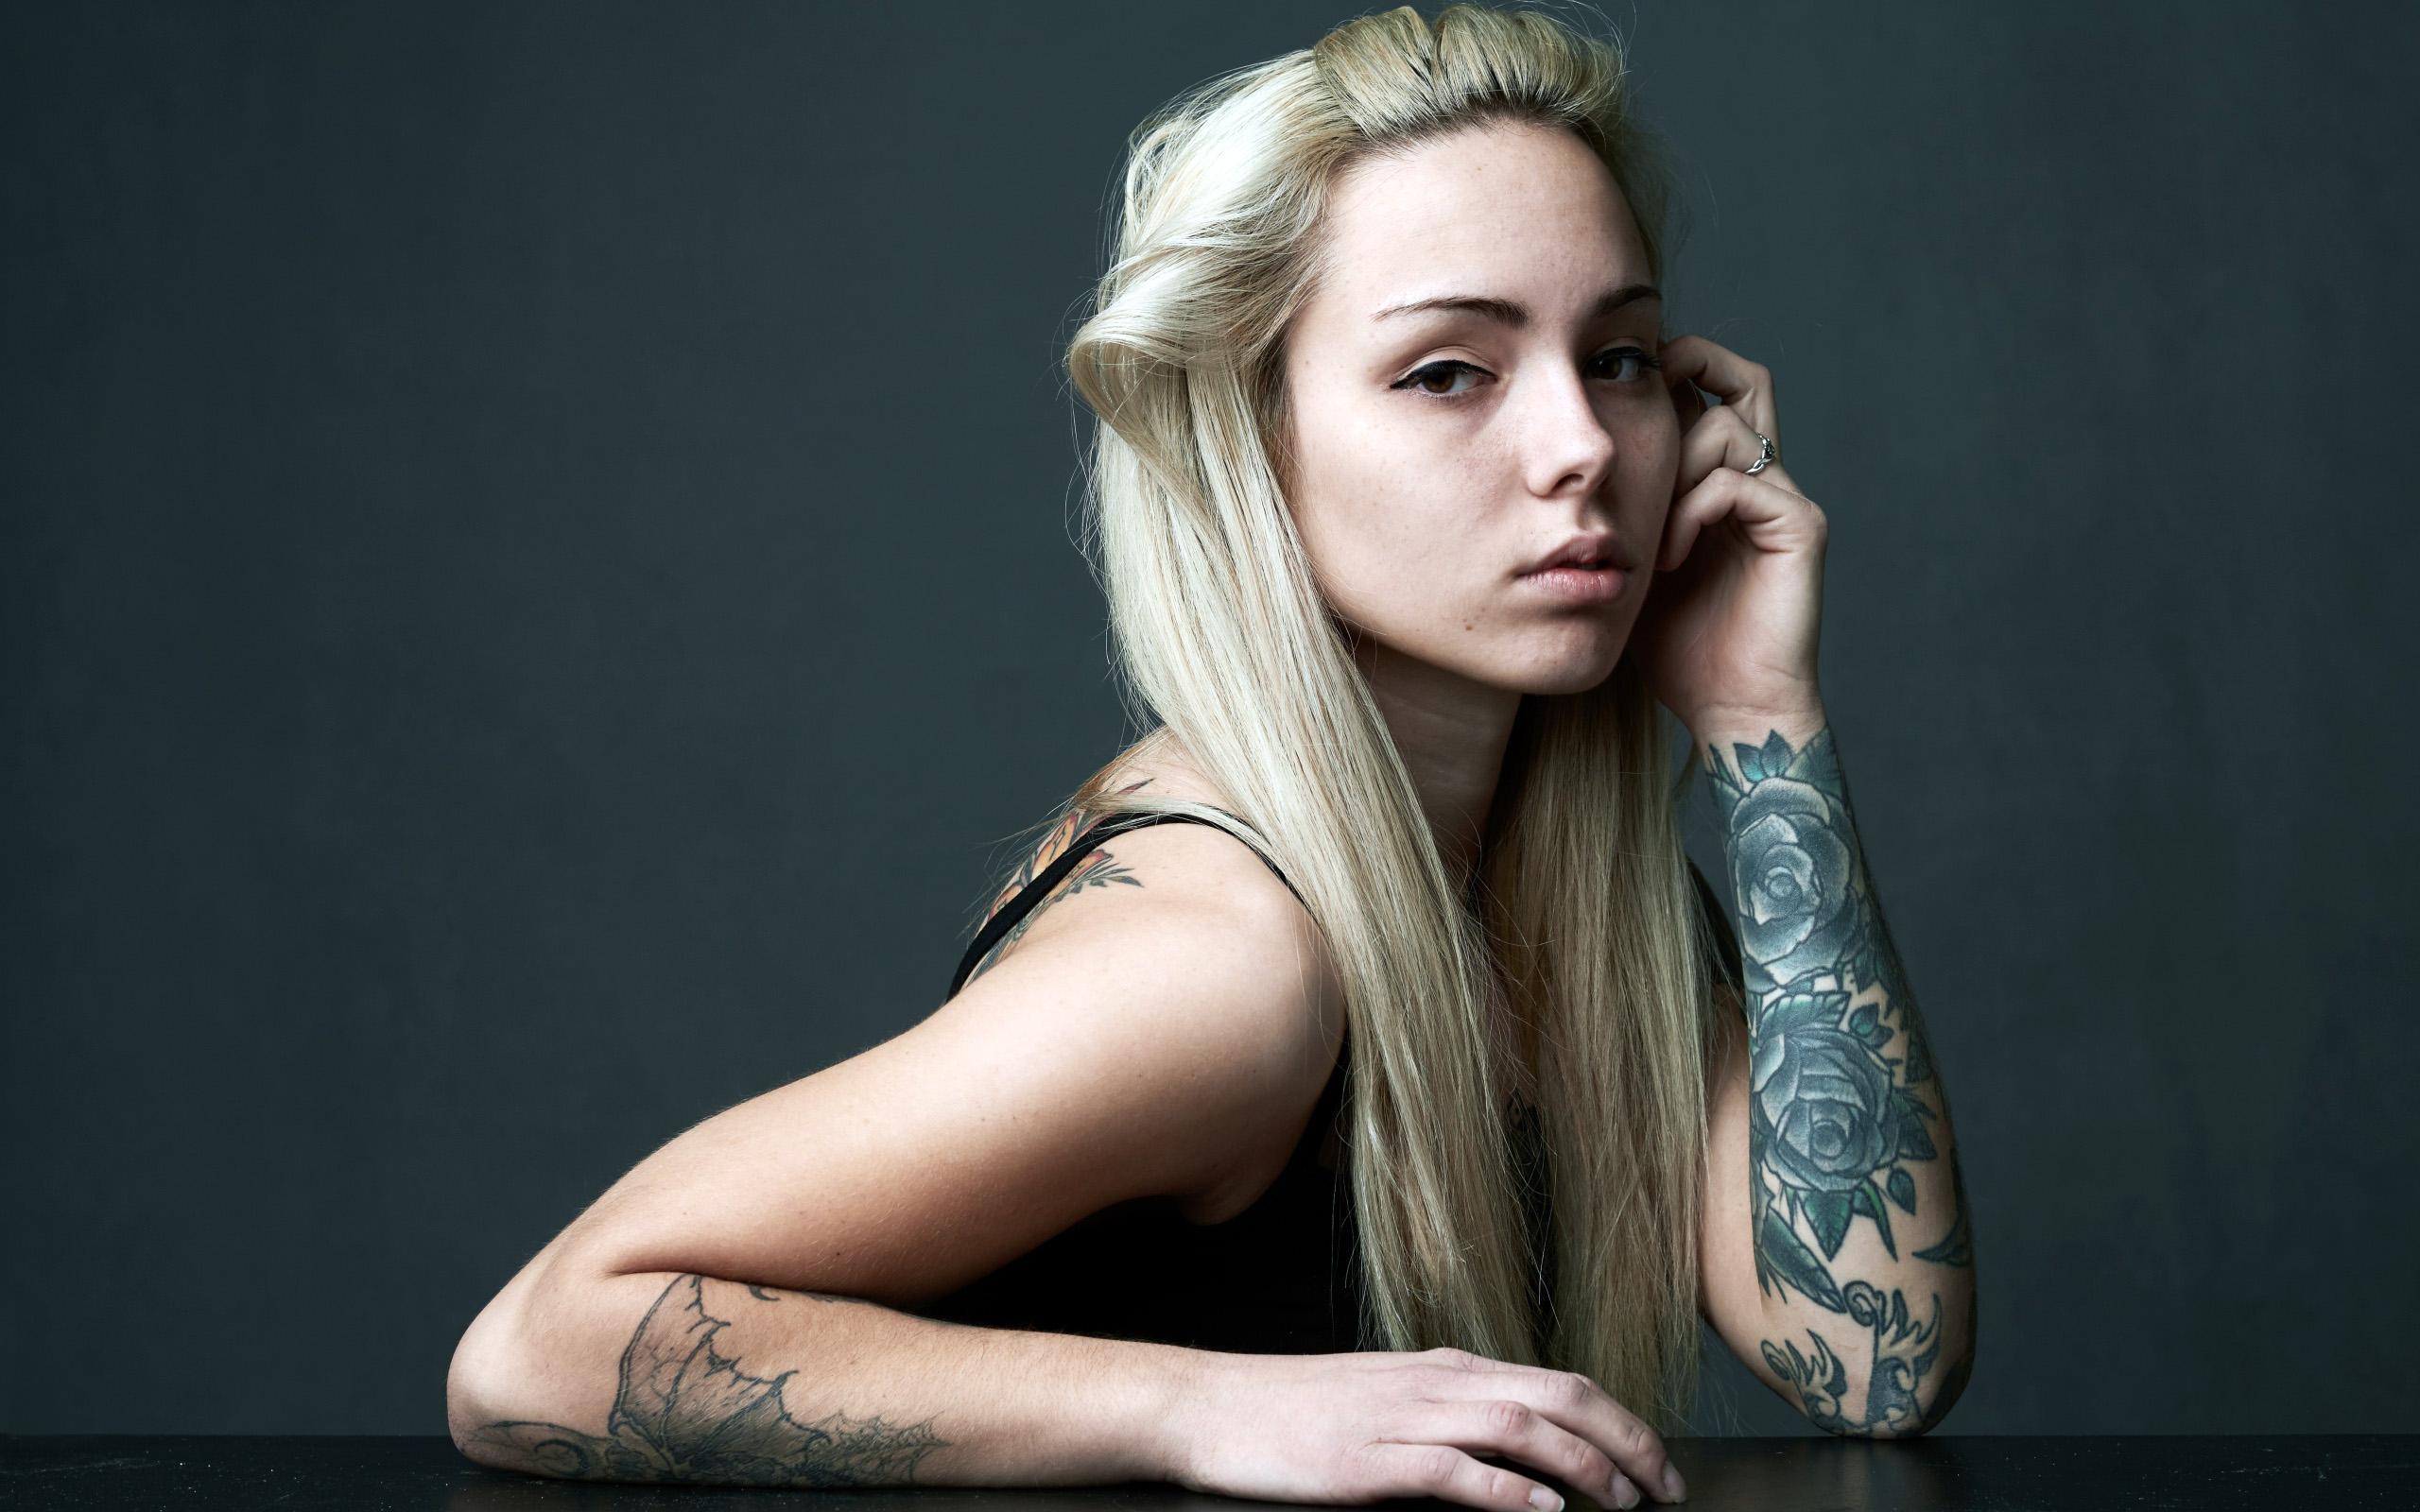 татуировки, девушка, тату на руке